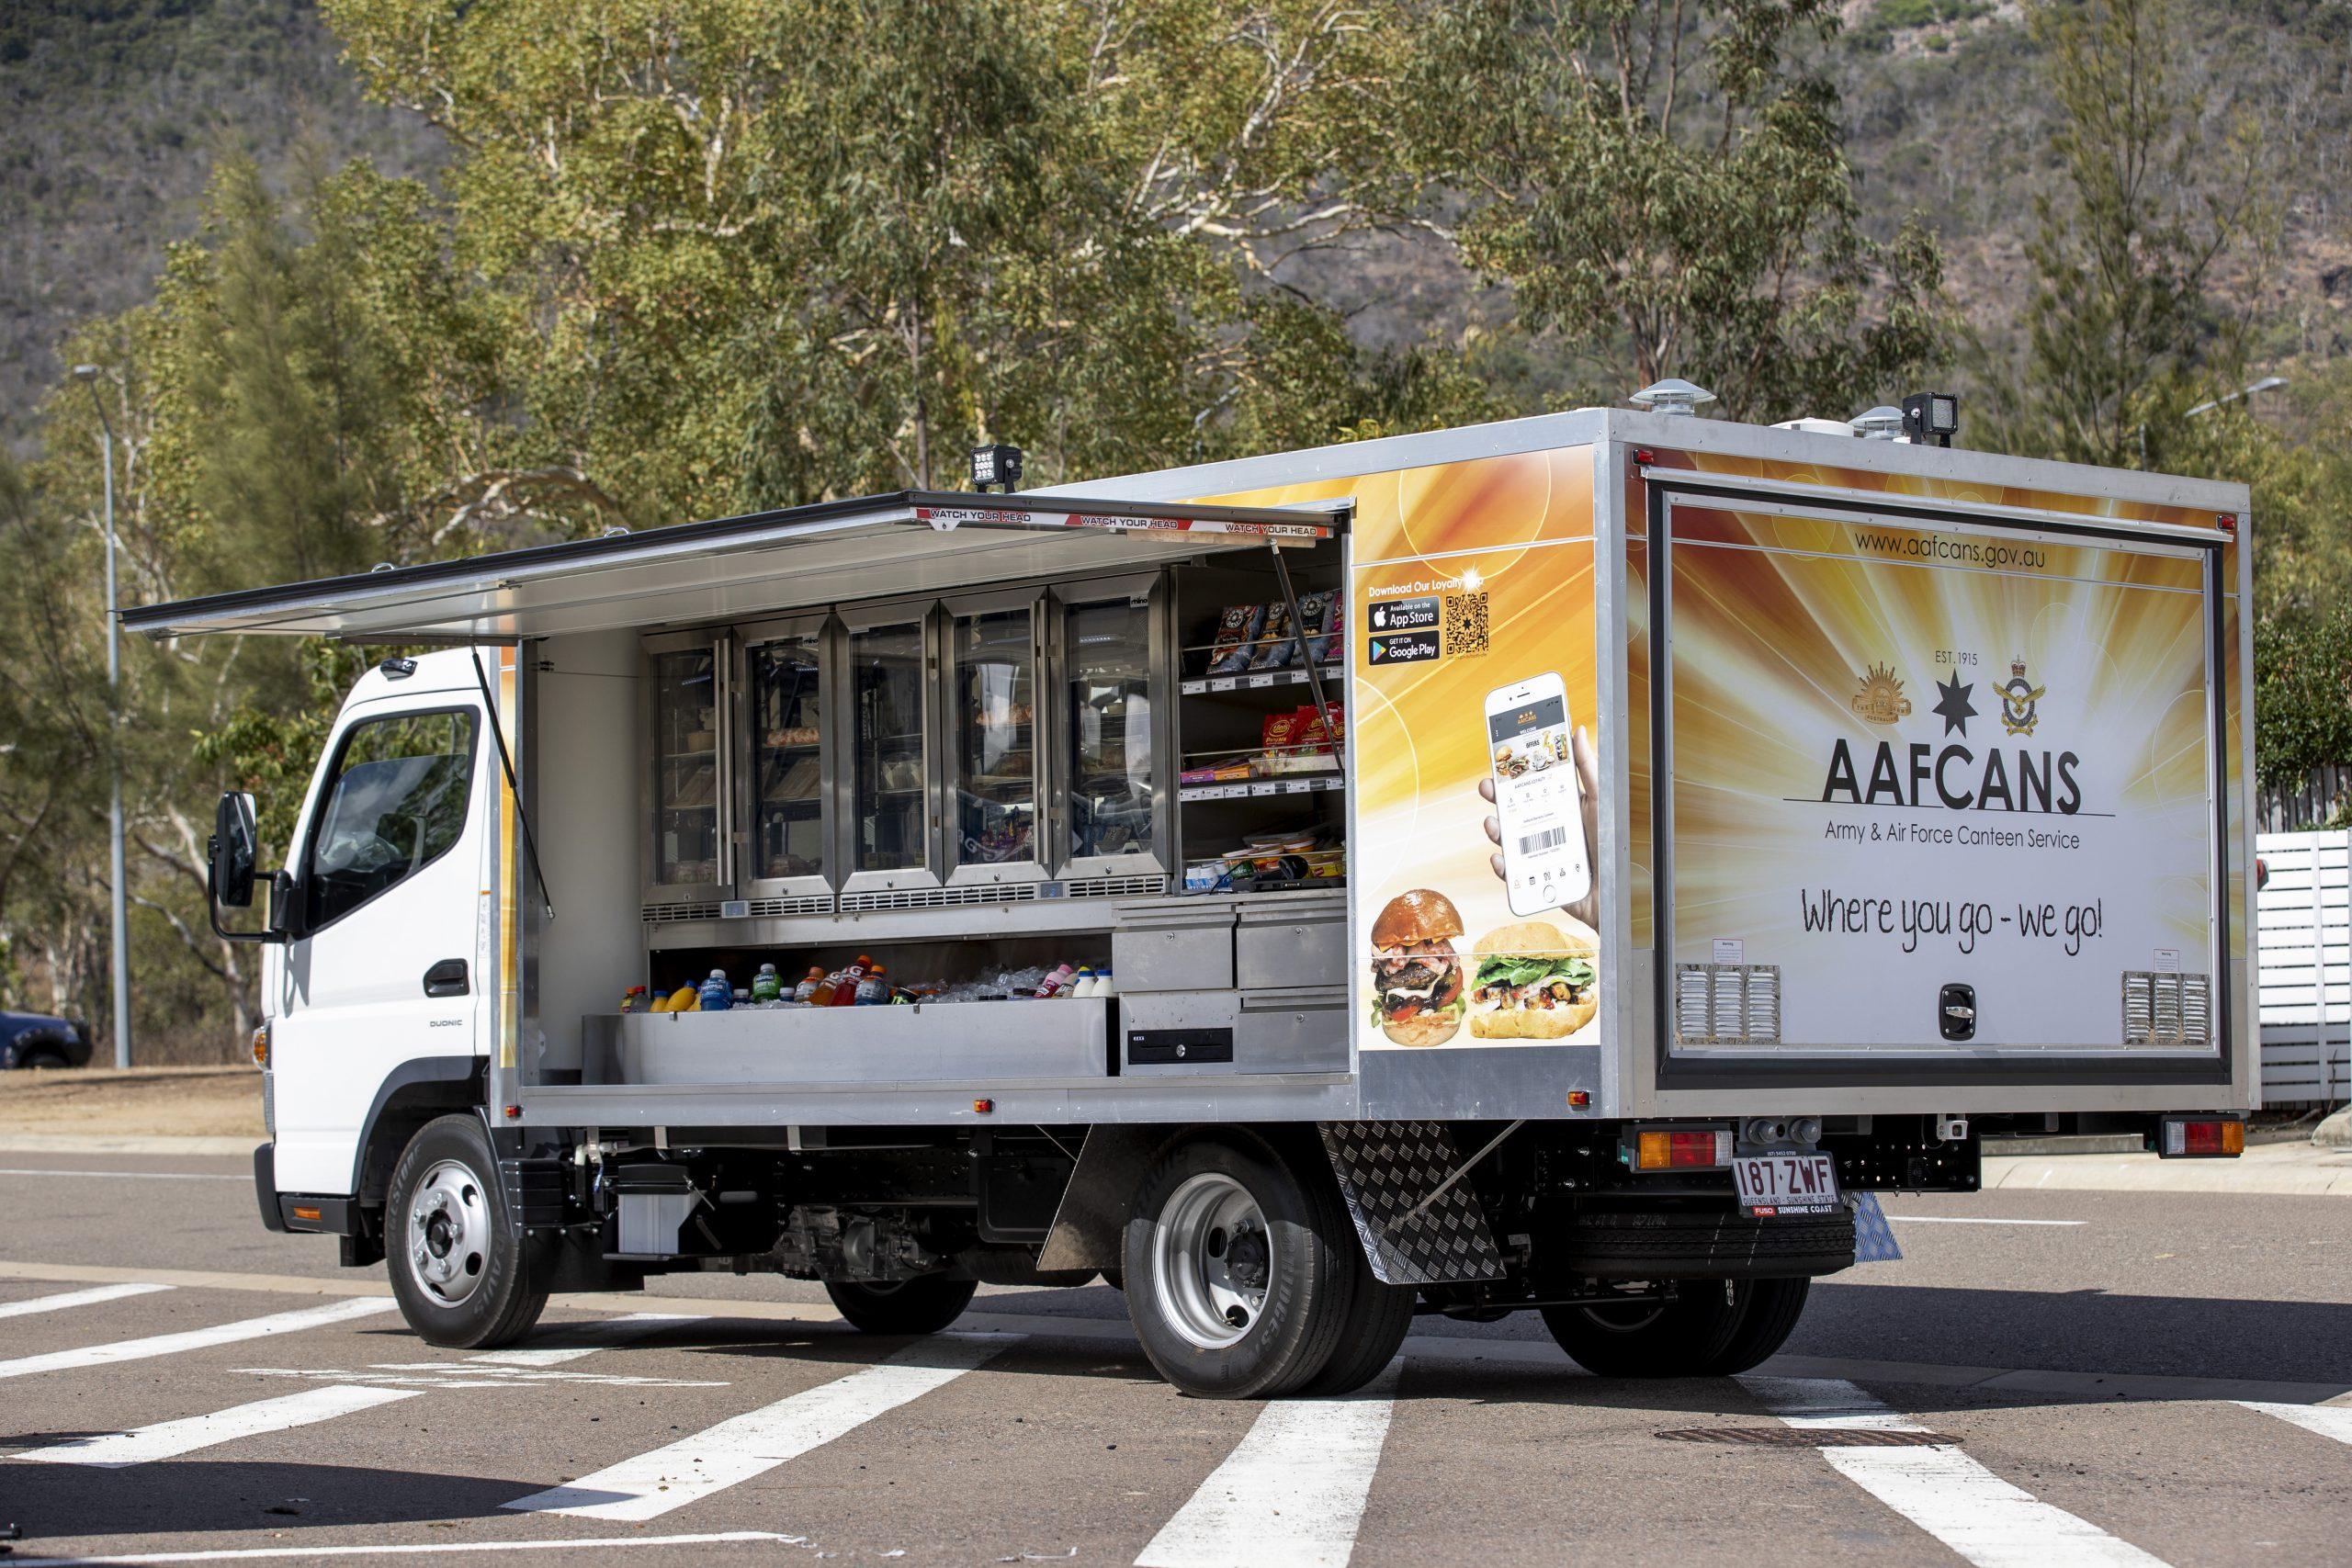 AAFCANS MOBILE FOOD VANS